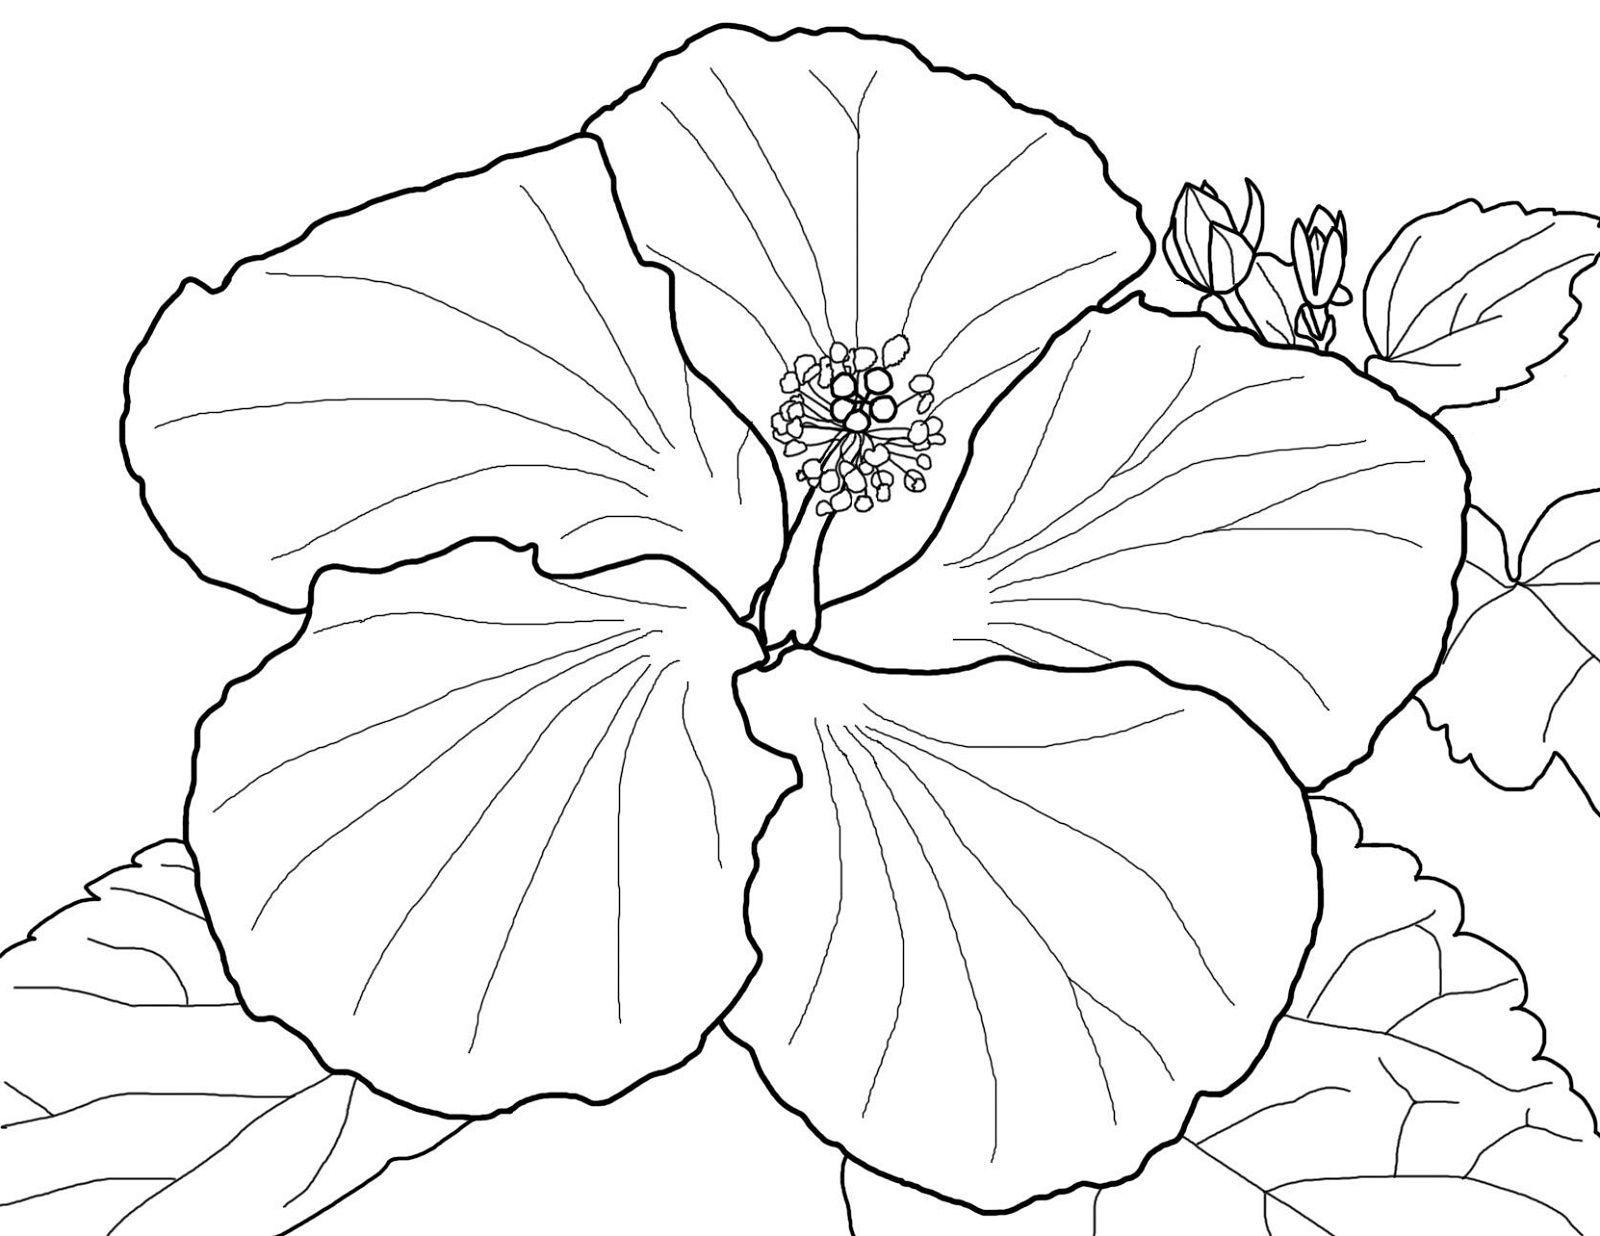 Hawaiian Flower Coloring Page Printable Shelter Coloring Flower Hawaiian Pag Flower Coloring Pages Printable Flower Coloring Pages Hibiscus Flower Drawing